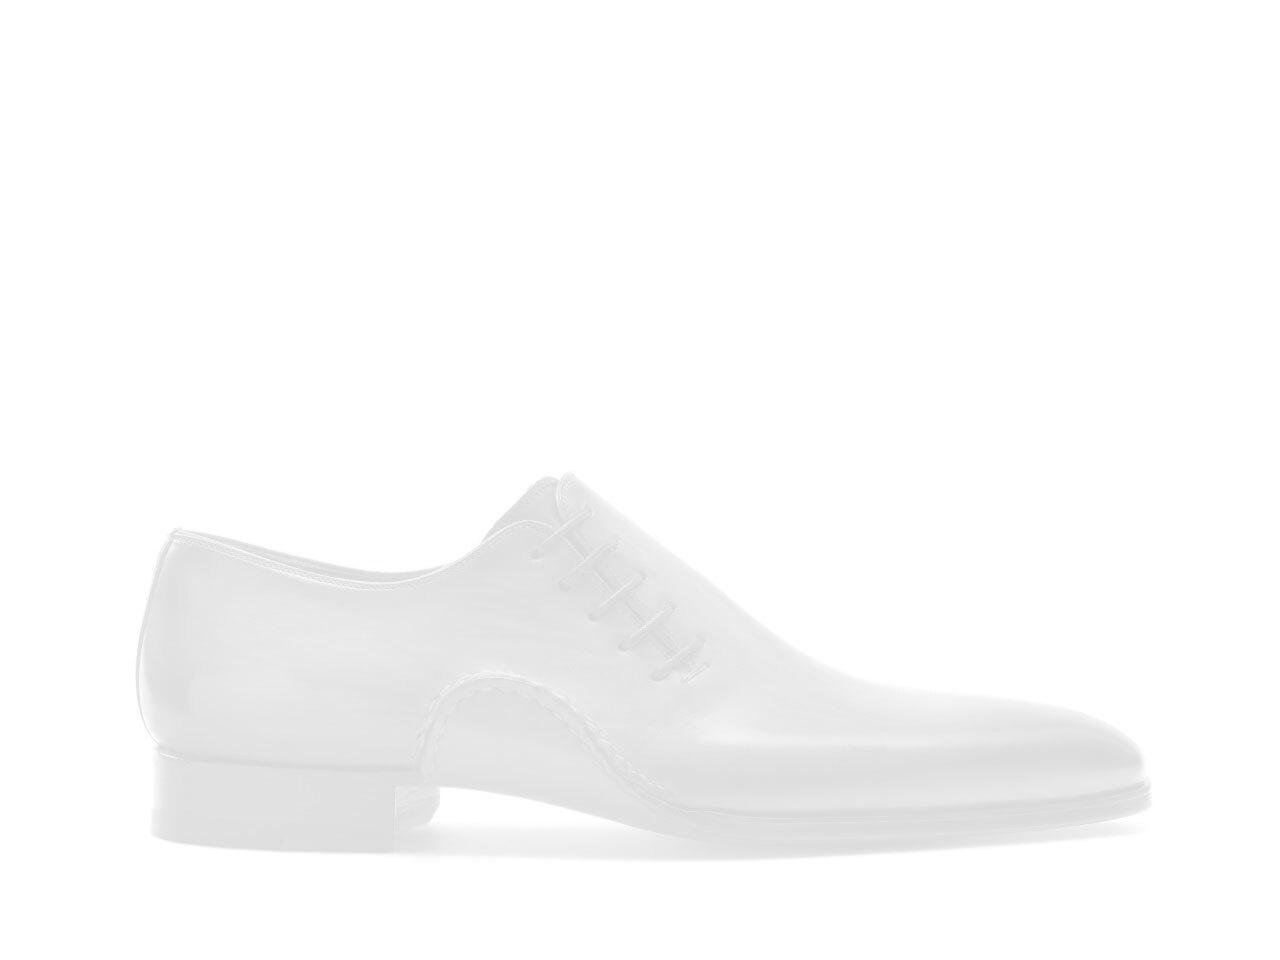 Pair of the Magnanni Rubio Grey Men's High Top Sneakers